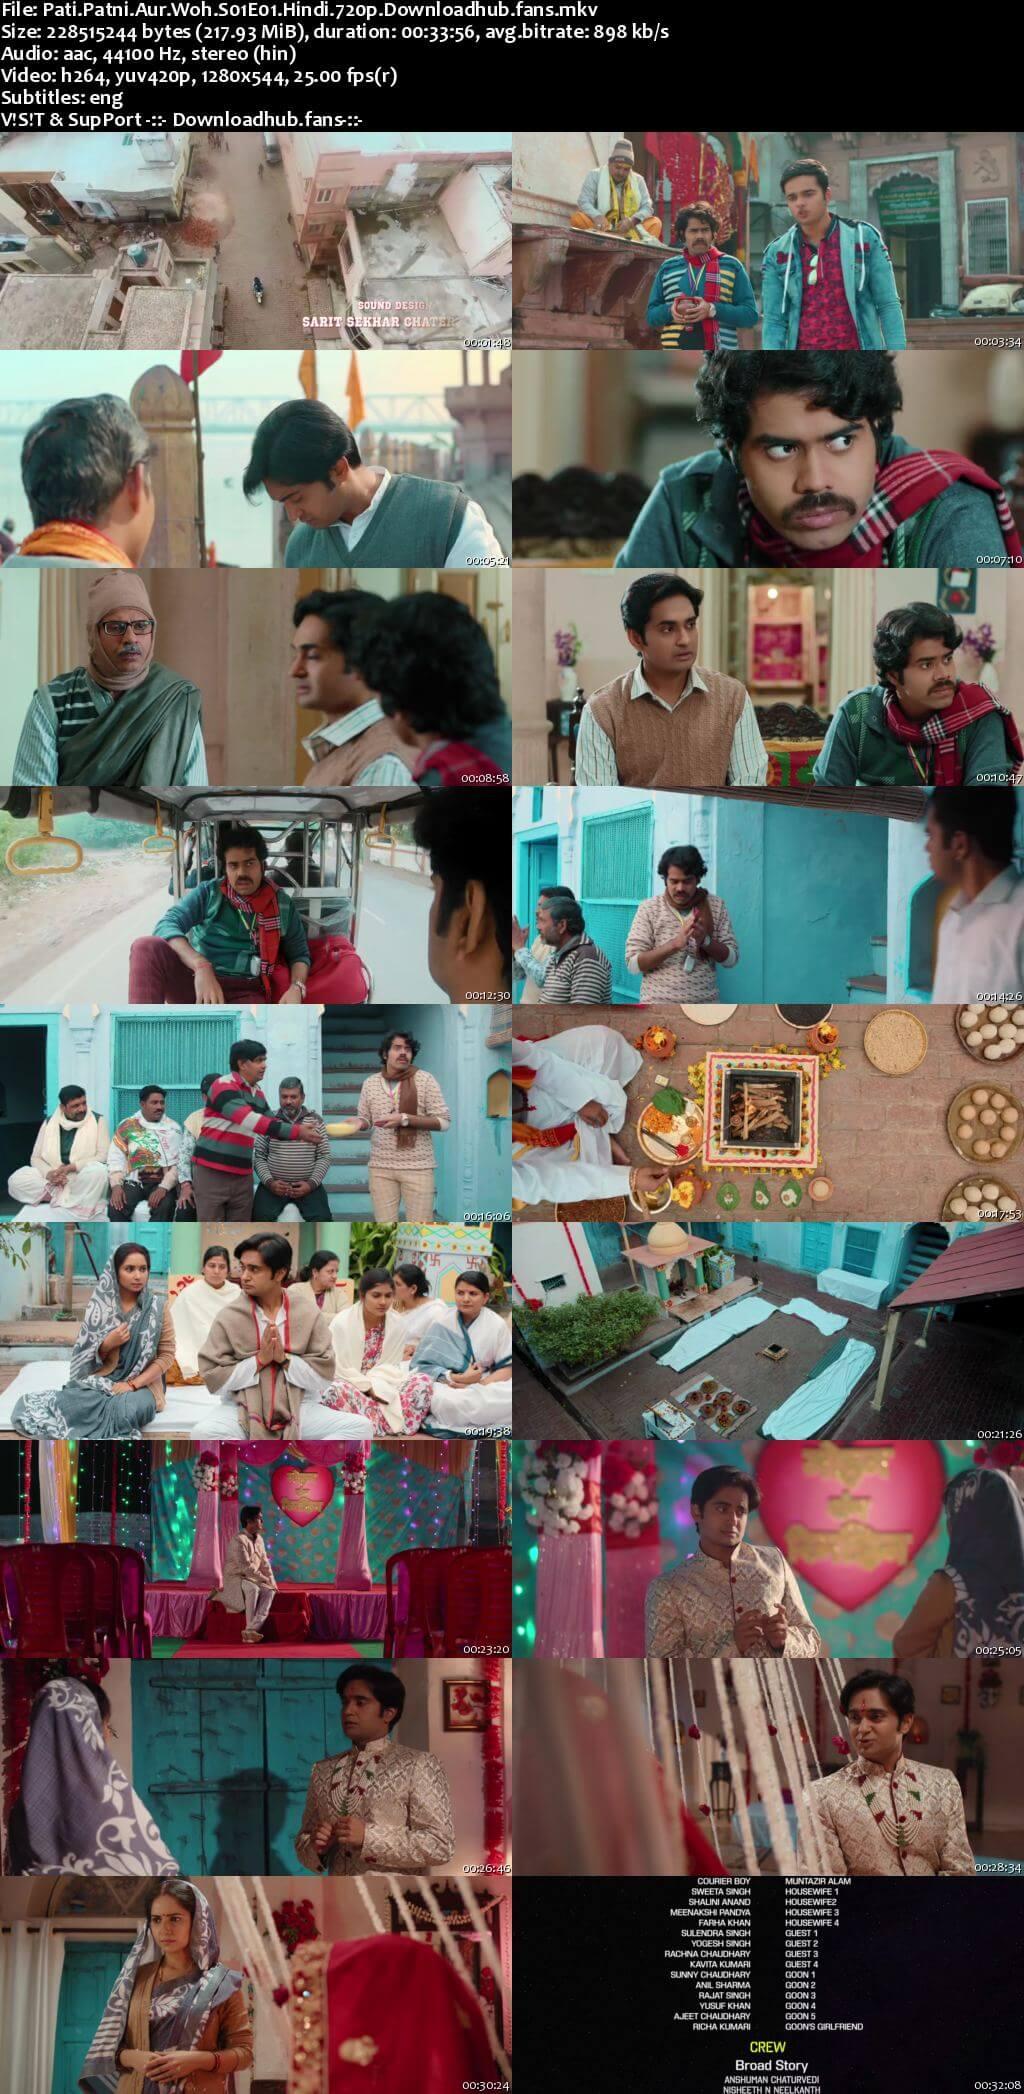 Pati Patni Aur Woh 2020 Hindi Season 01 Complete 720p HDRip ESubs